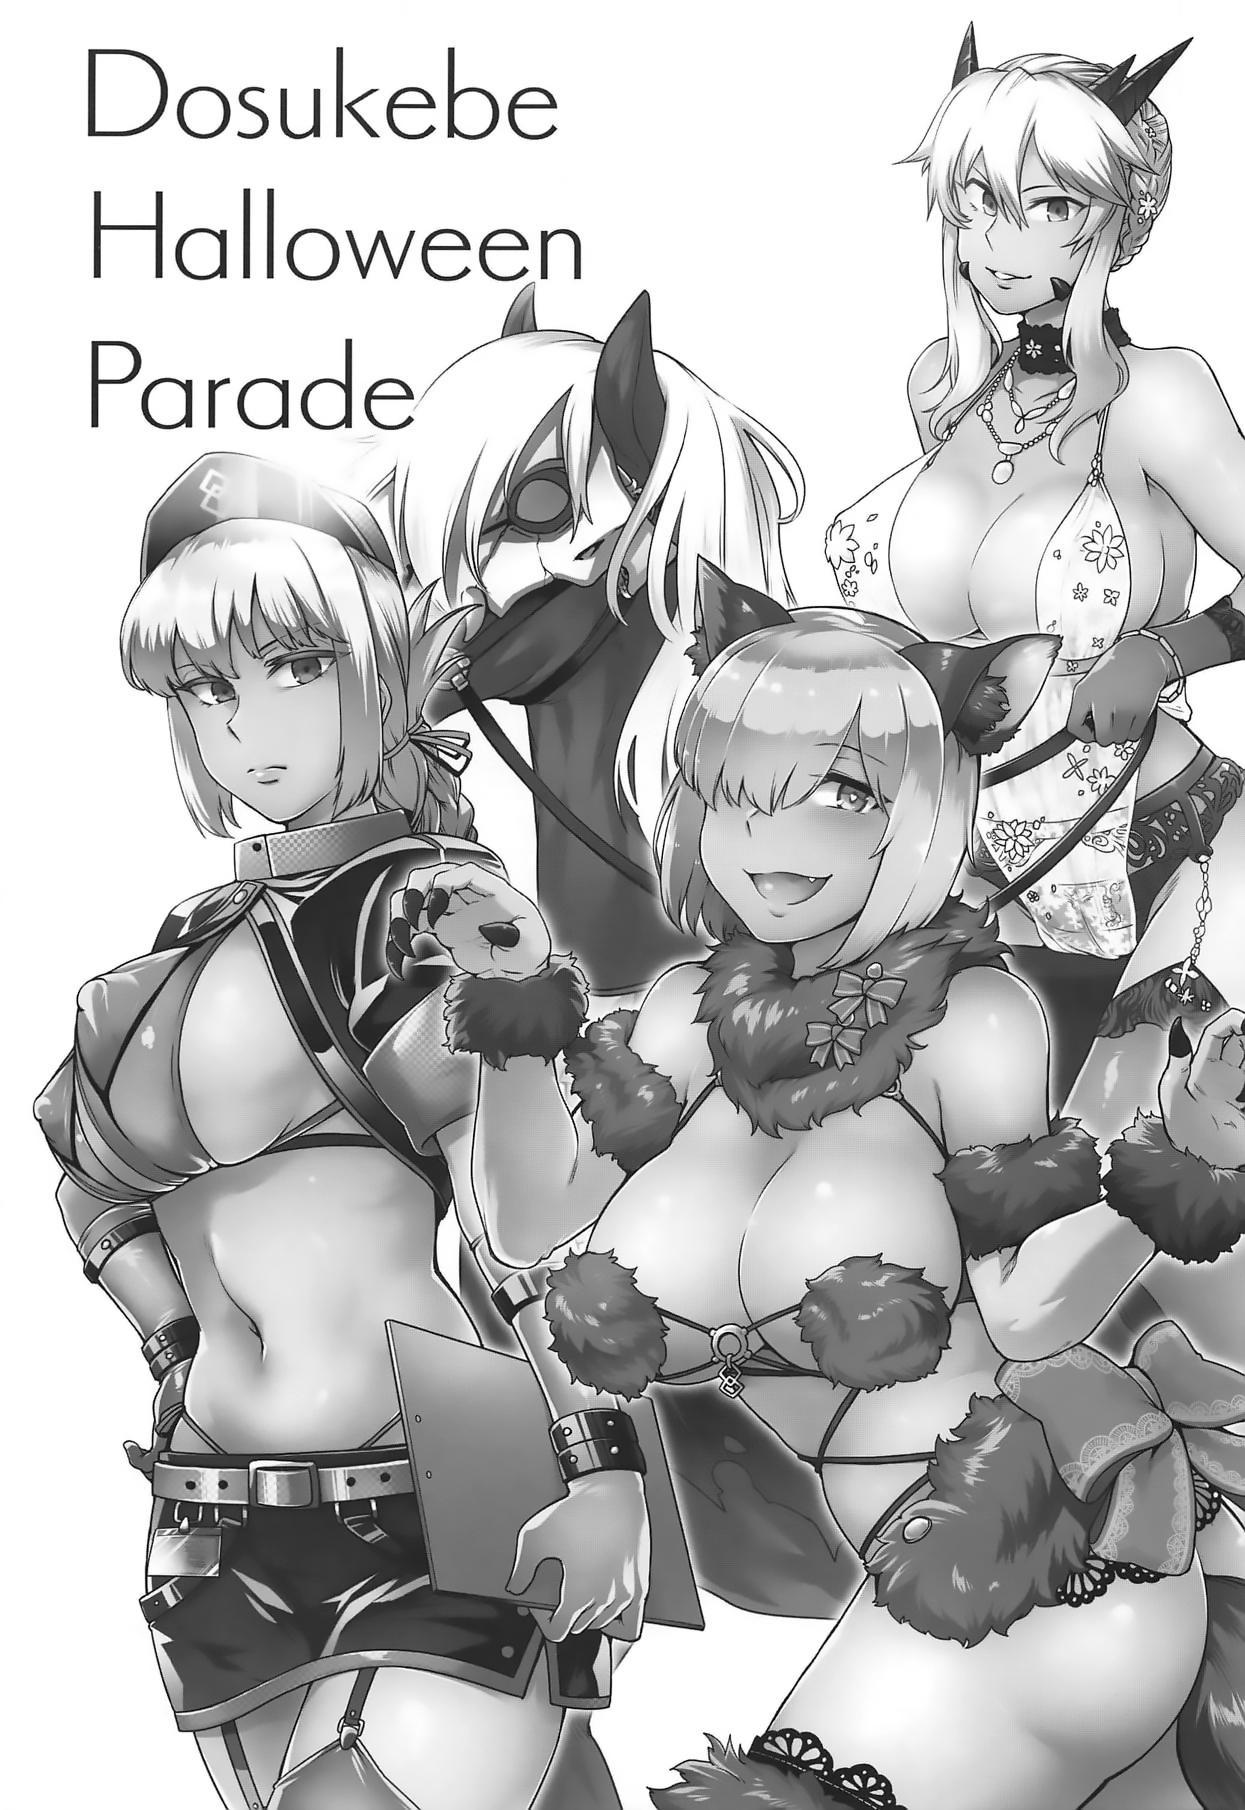 Dosukebe Halloween Parade 1